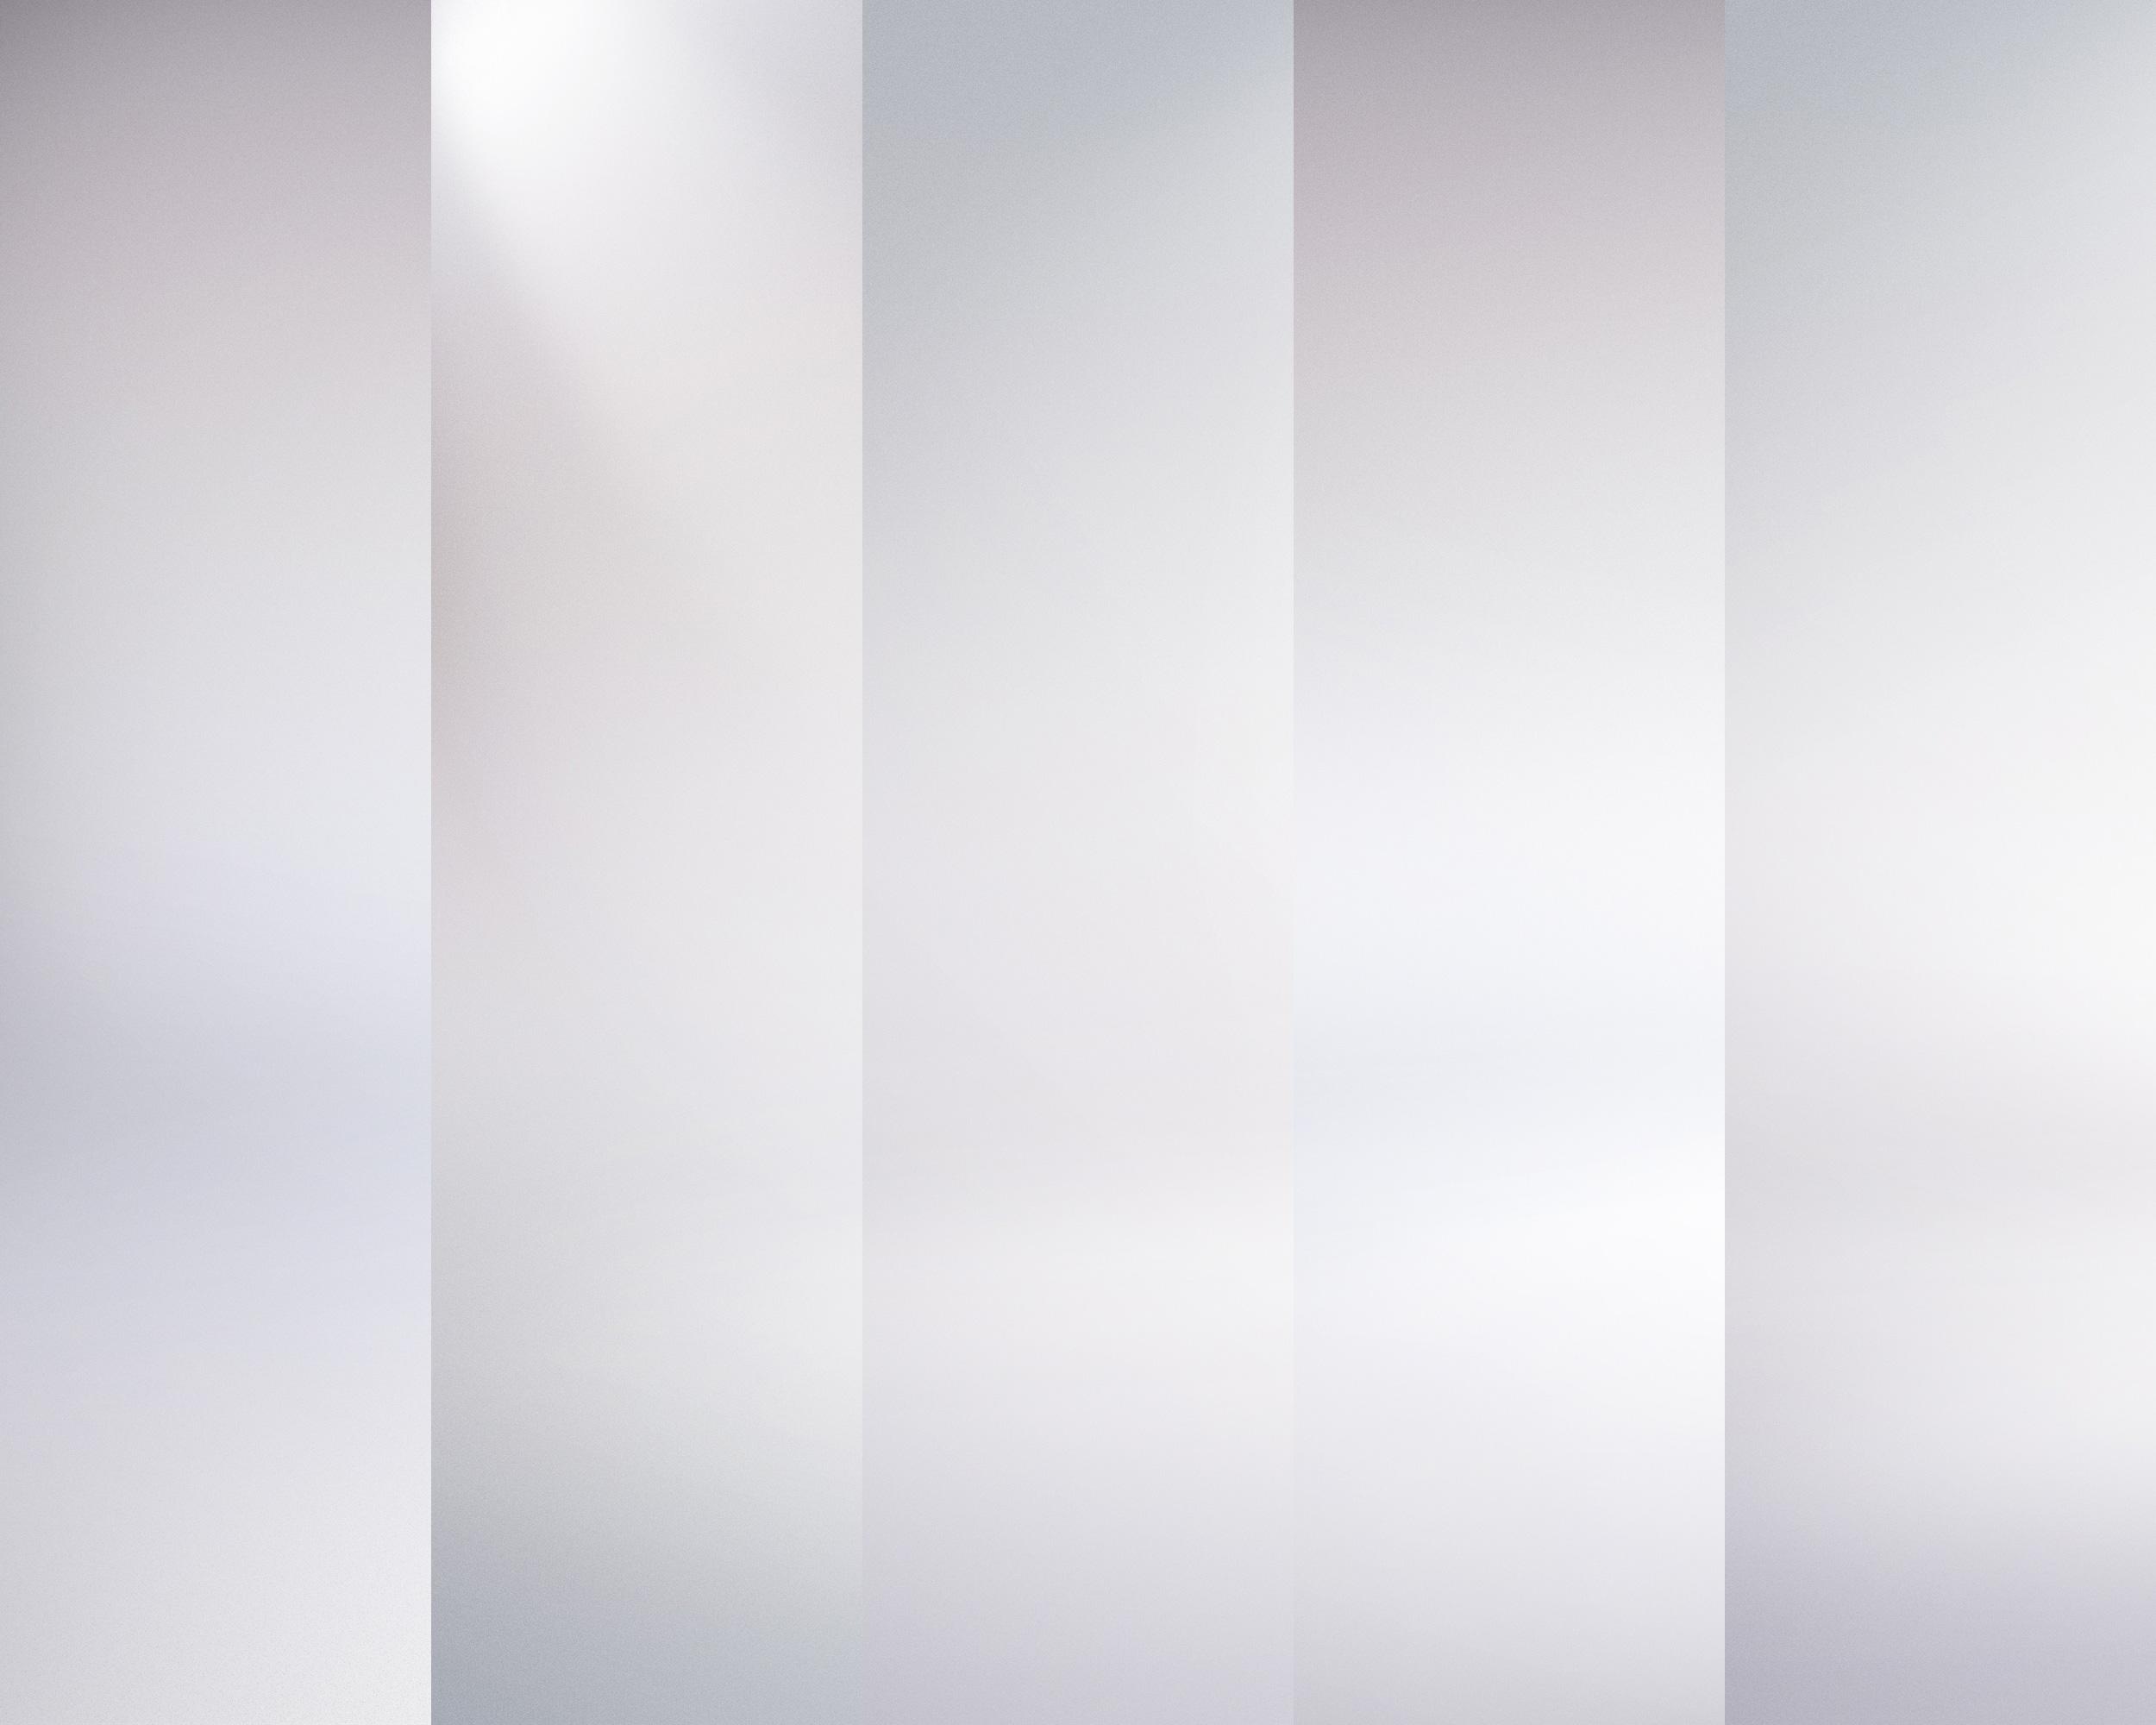 5 Infinite White Studio Backdrops Graphicburger